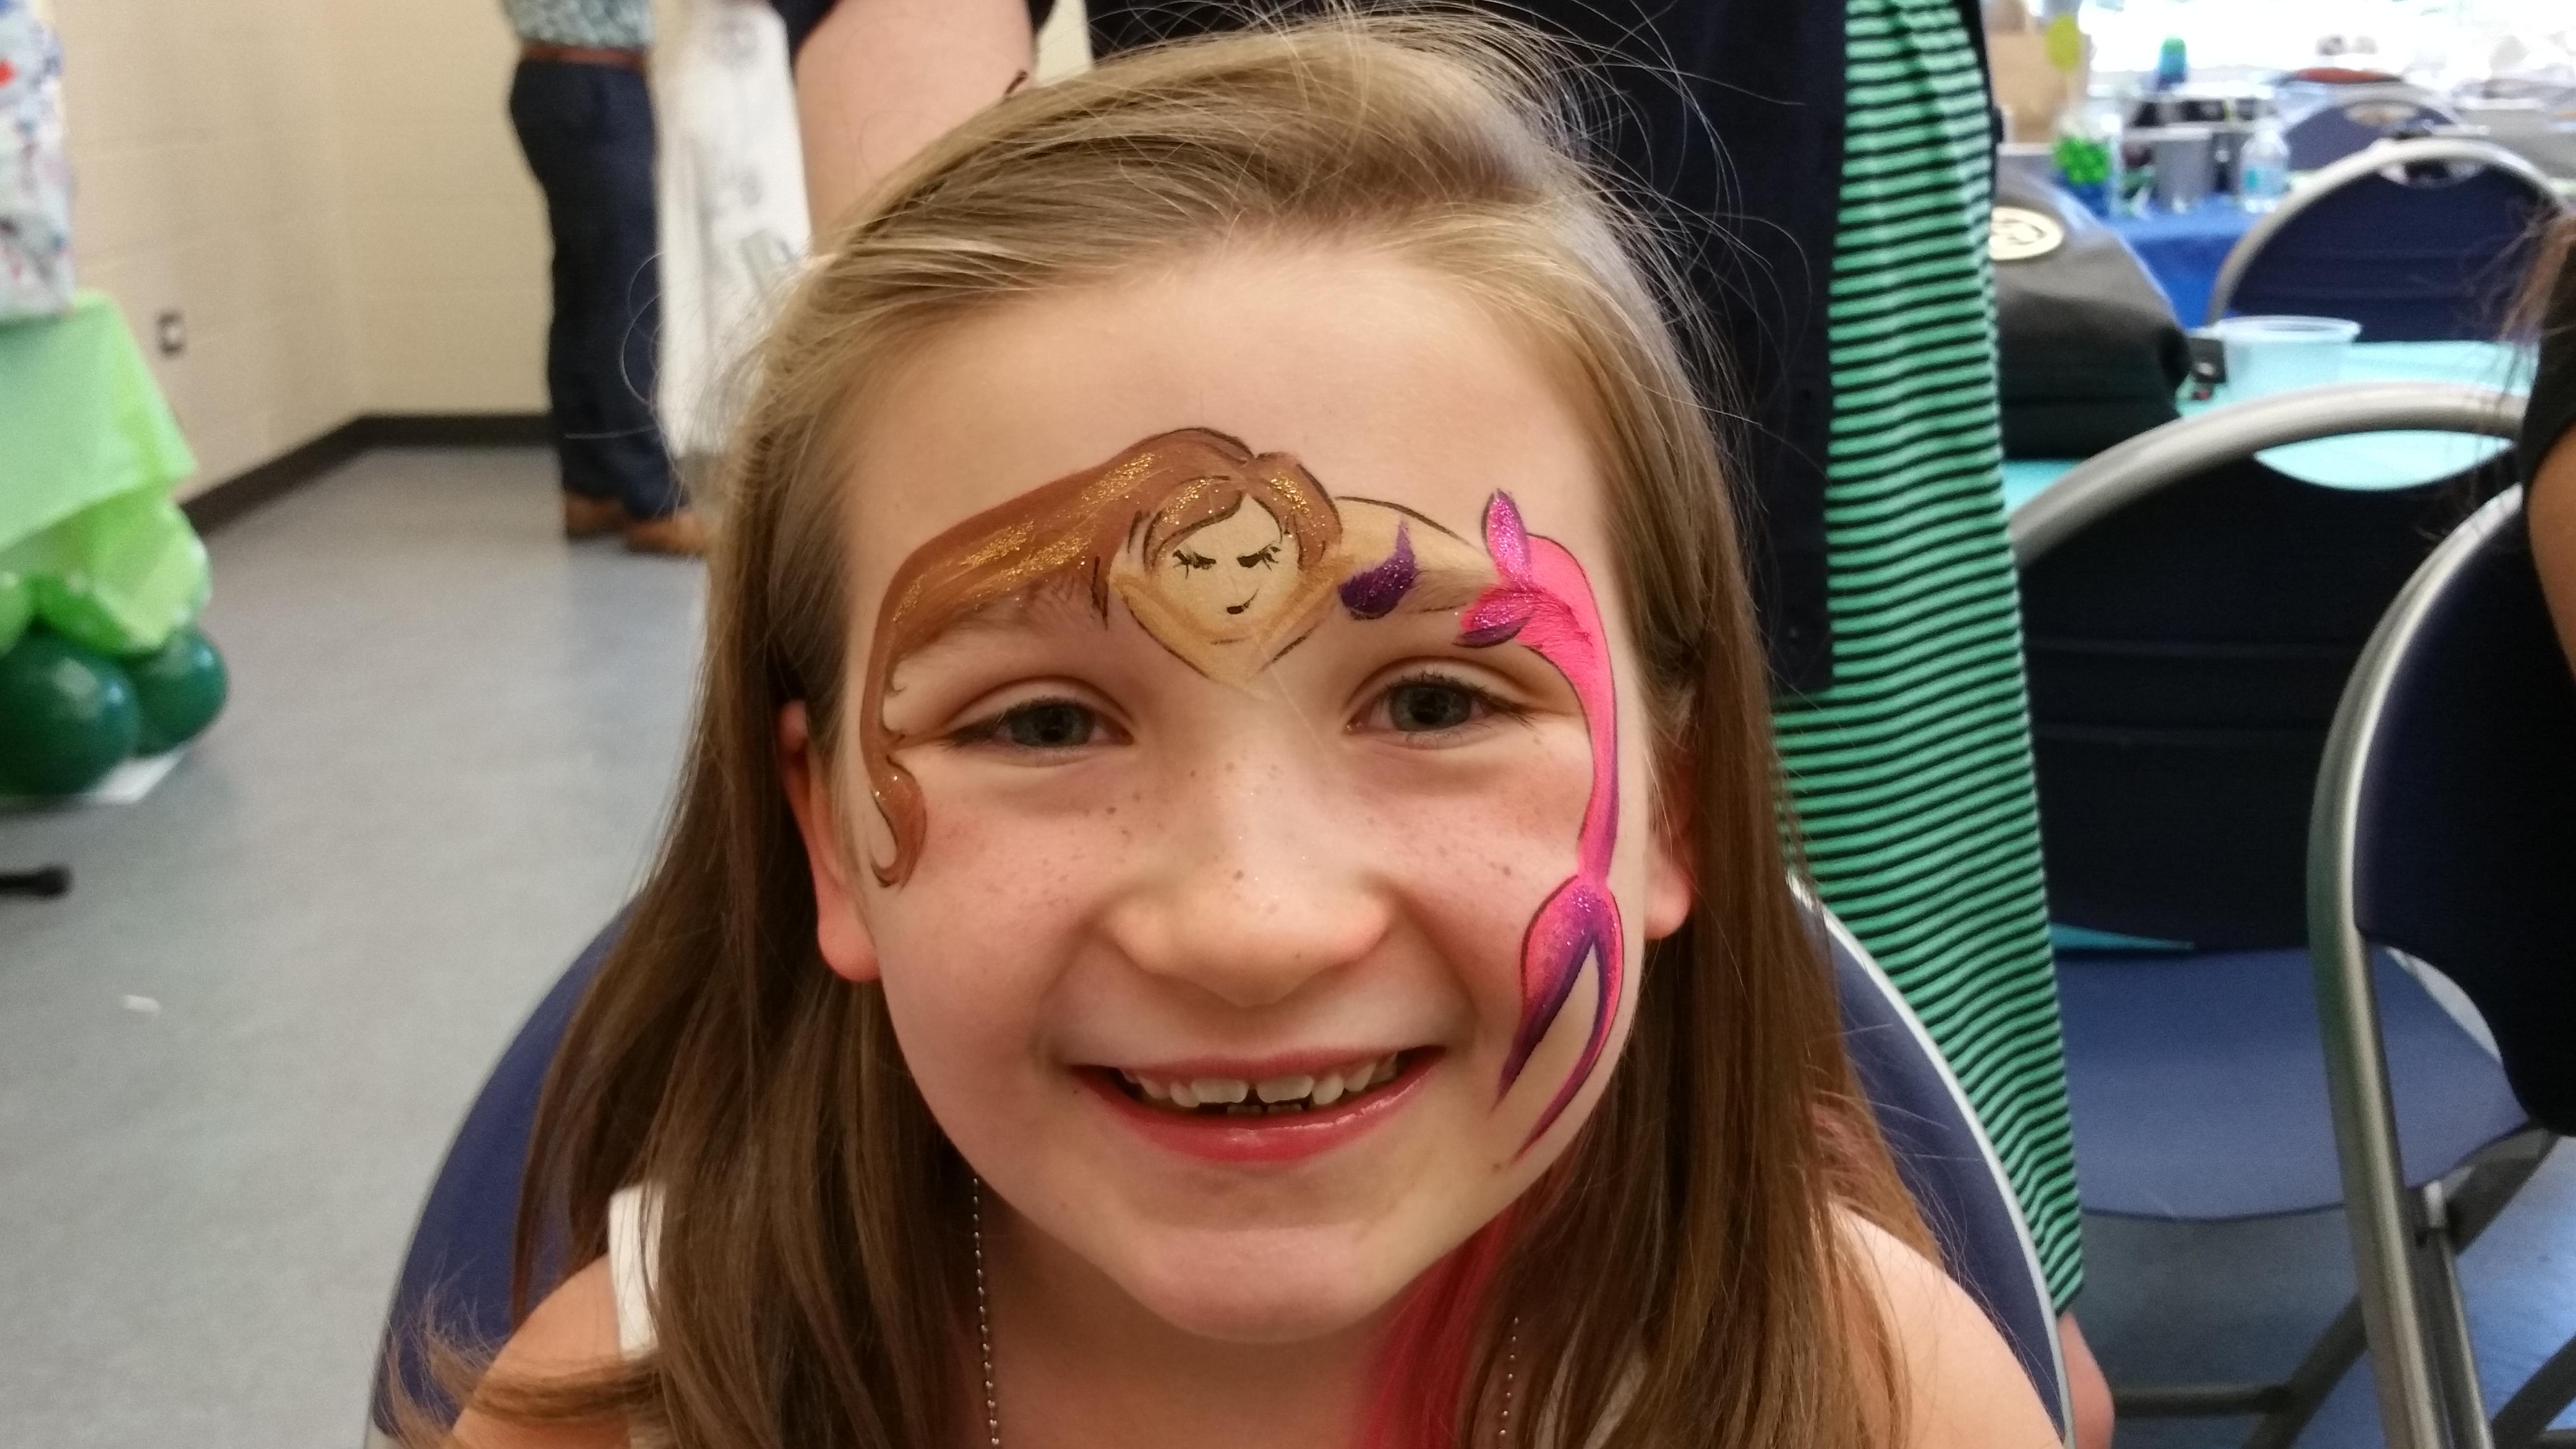 Mermaid over eye face paint